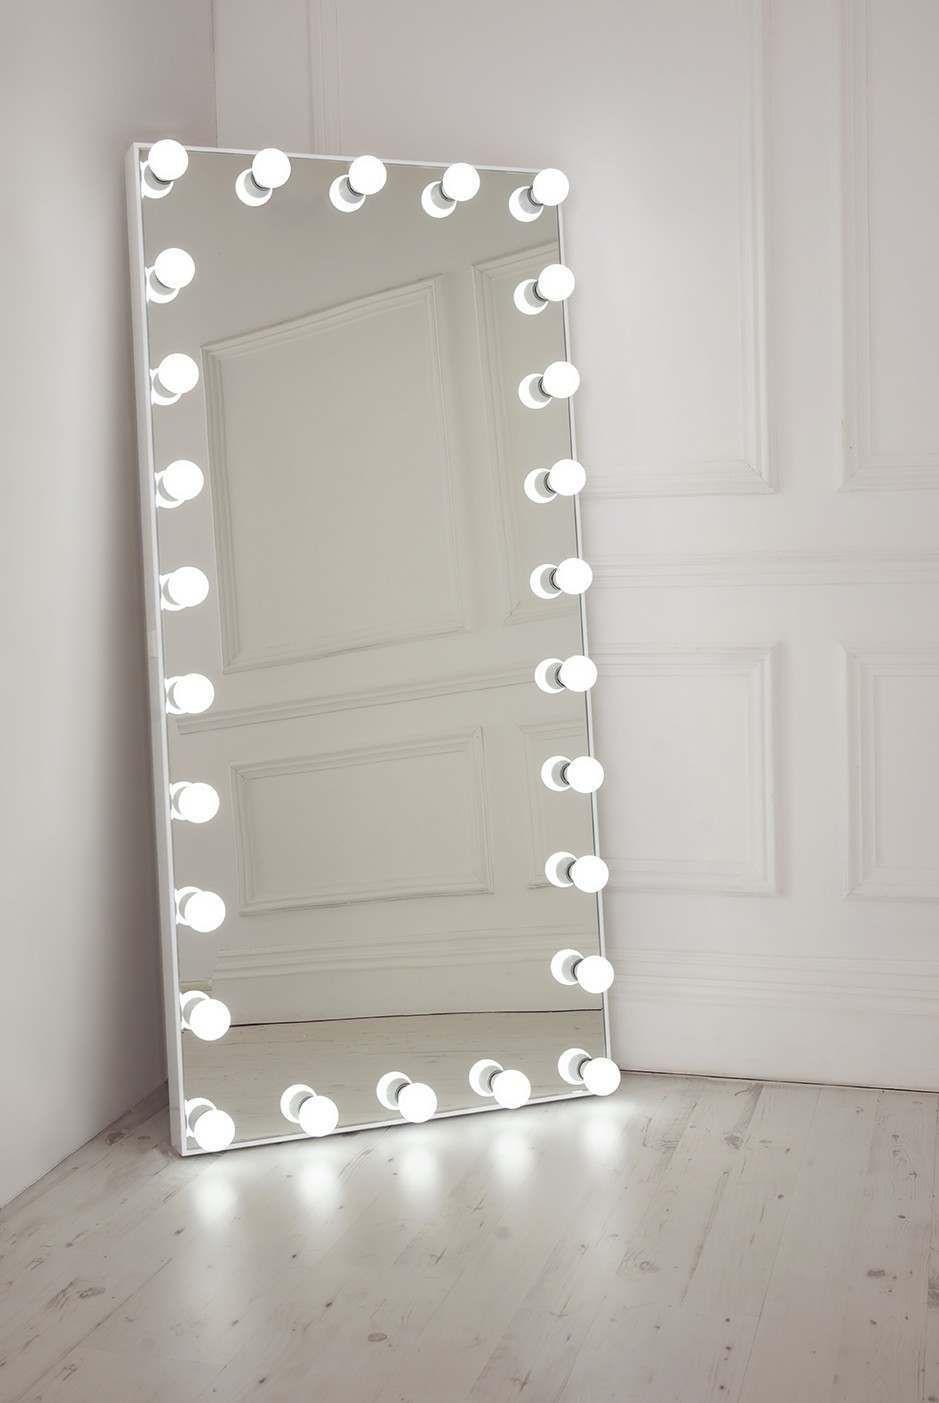 Floor Length Mirror With Lights  Walesfootprintorg